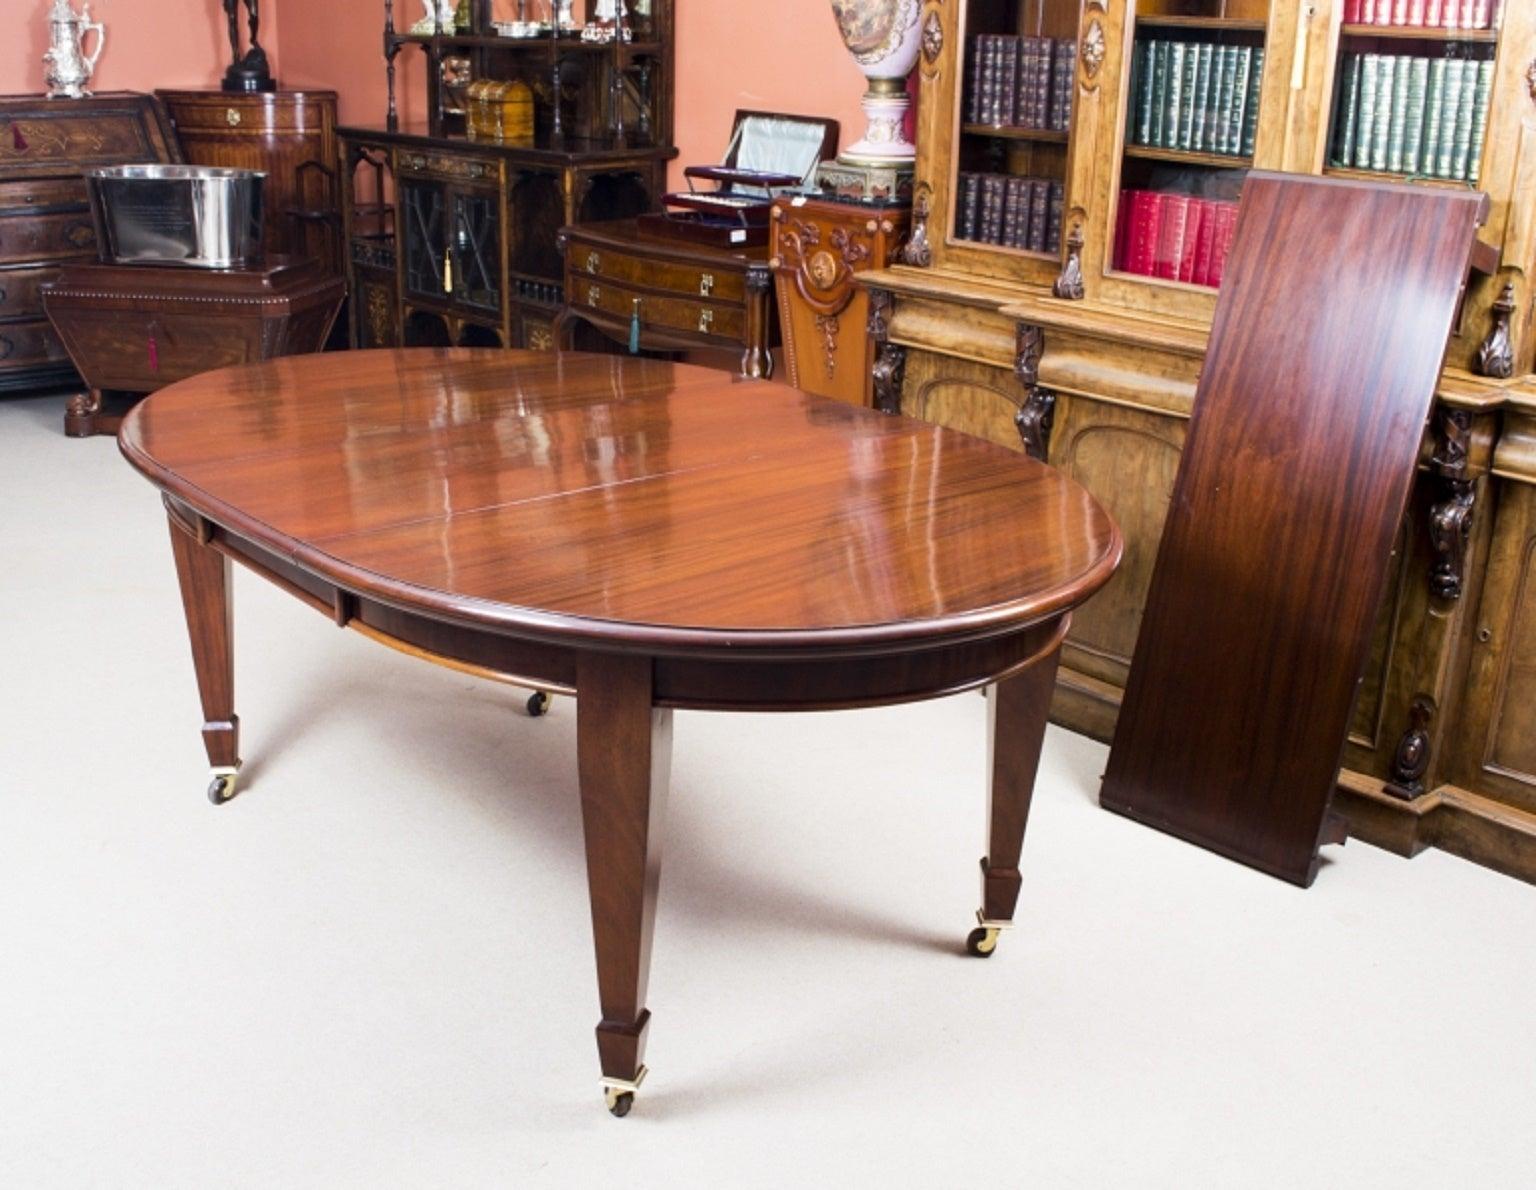 Antique edwardian mahogany dining table circa 1900 at 1stdibs workwithnaturefo